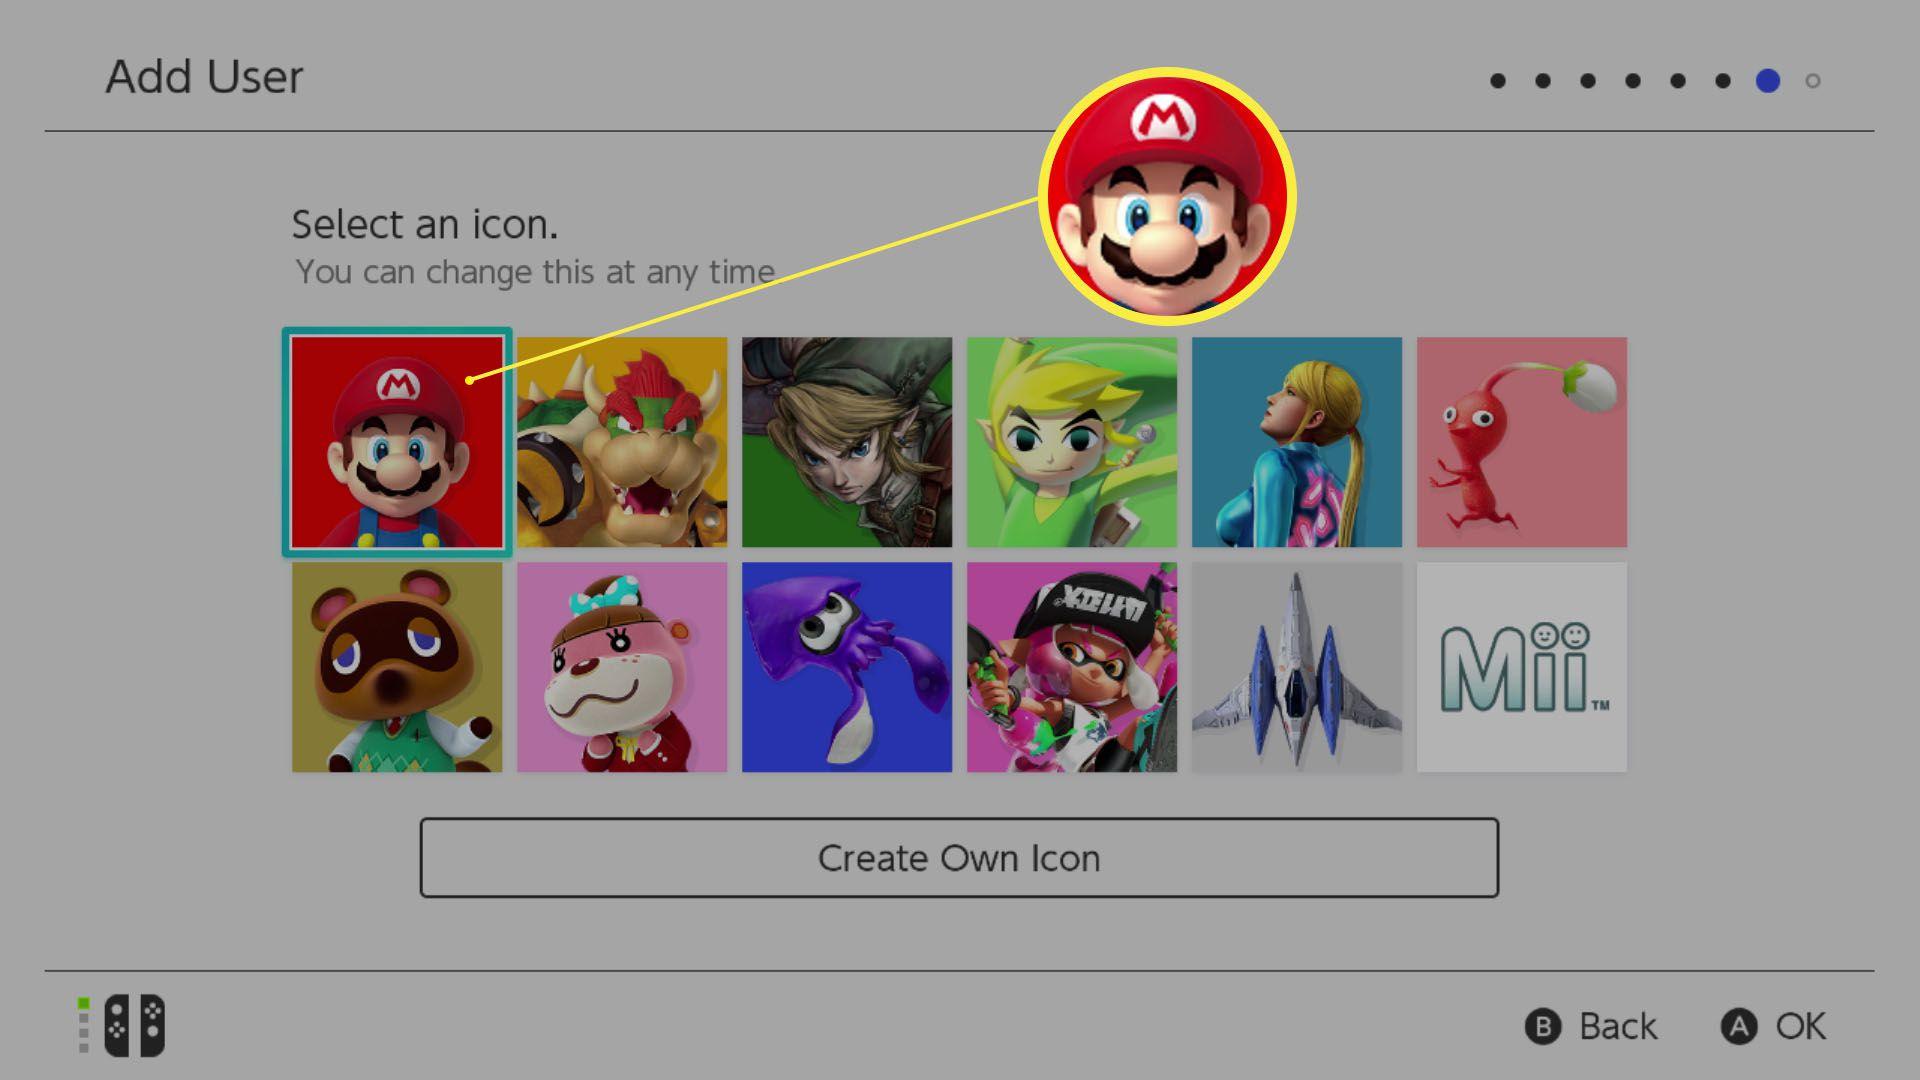 Nintendo Switch setup Add User screen